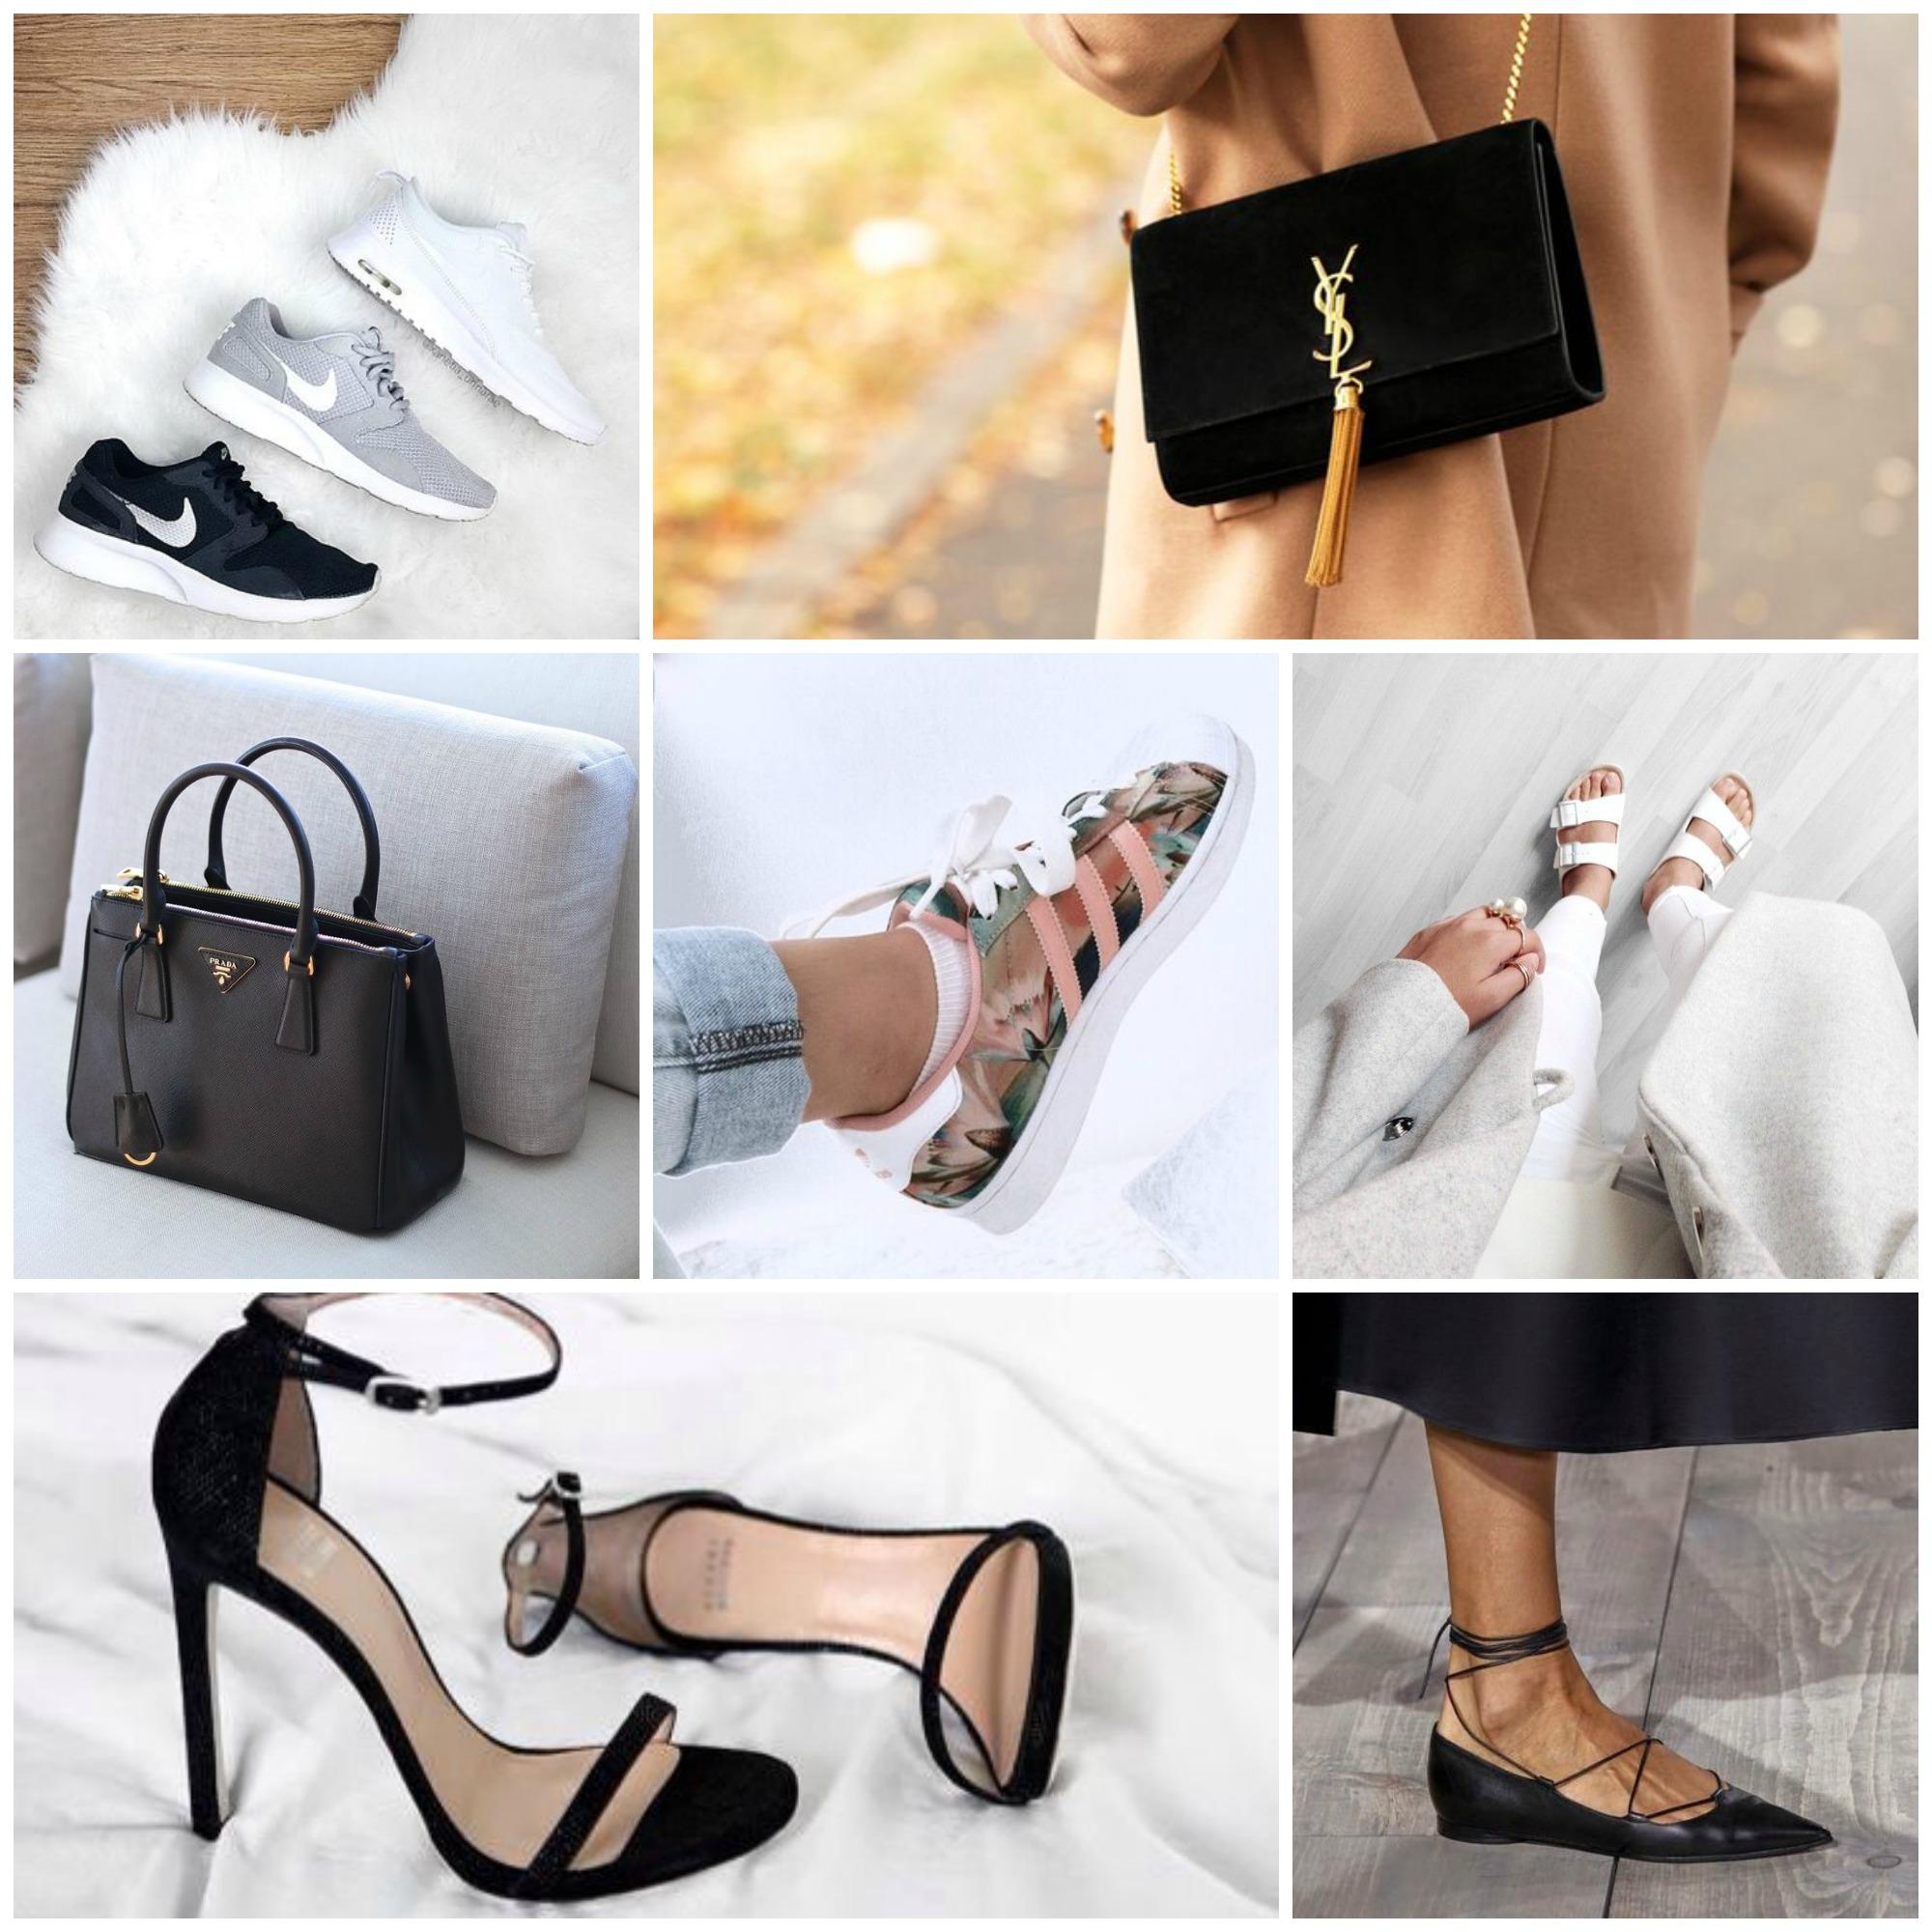 Shoes blog